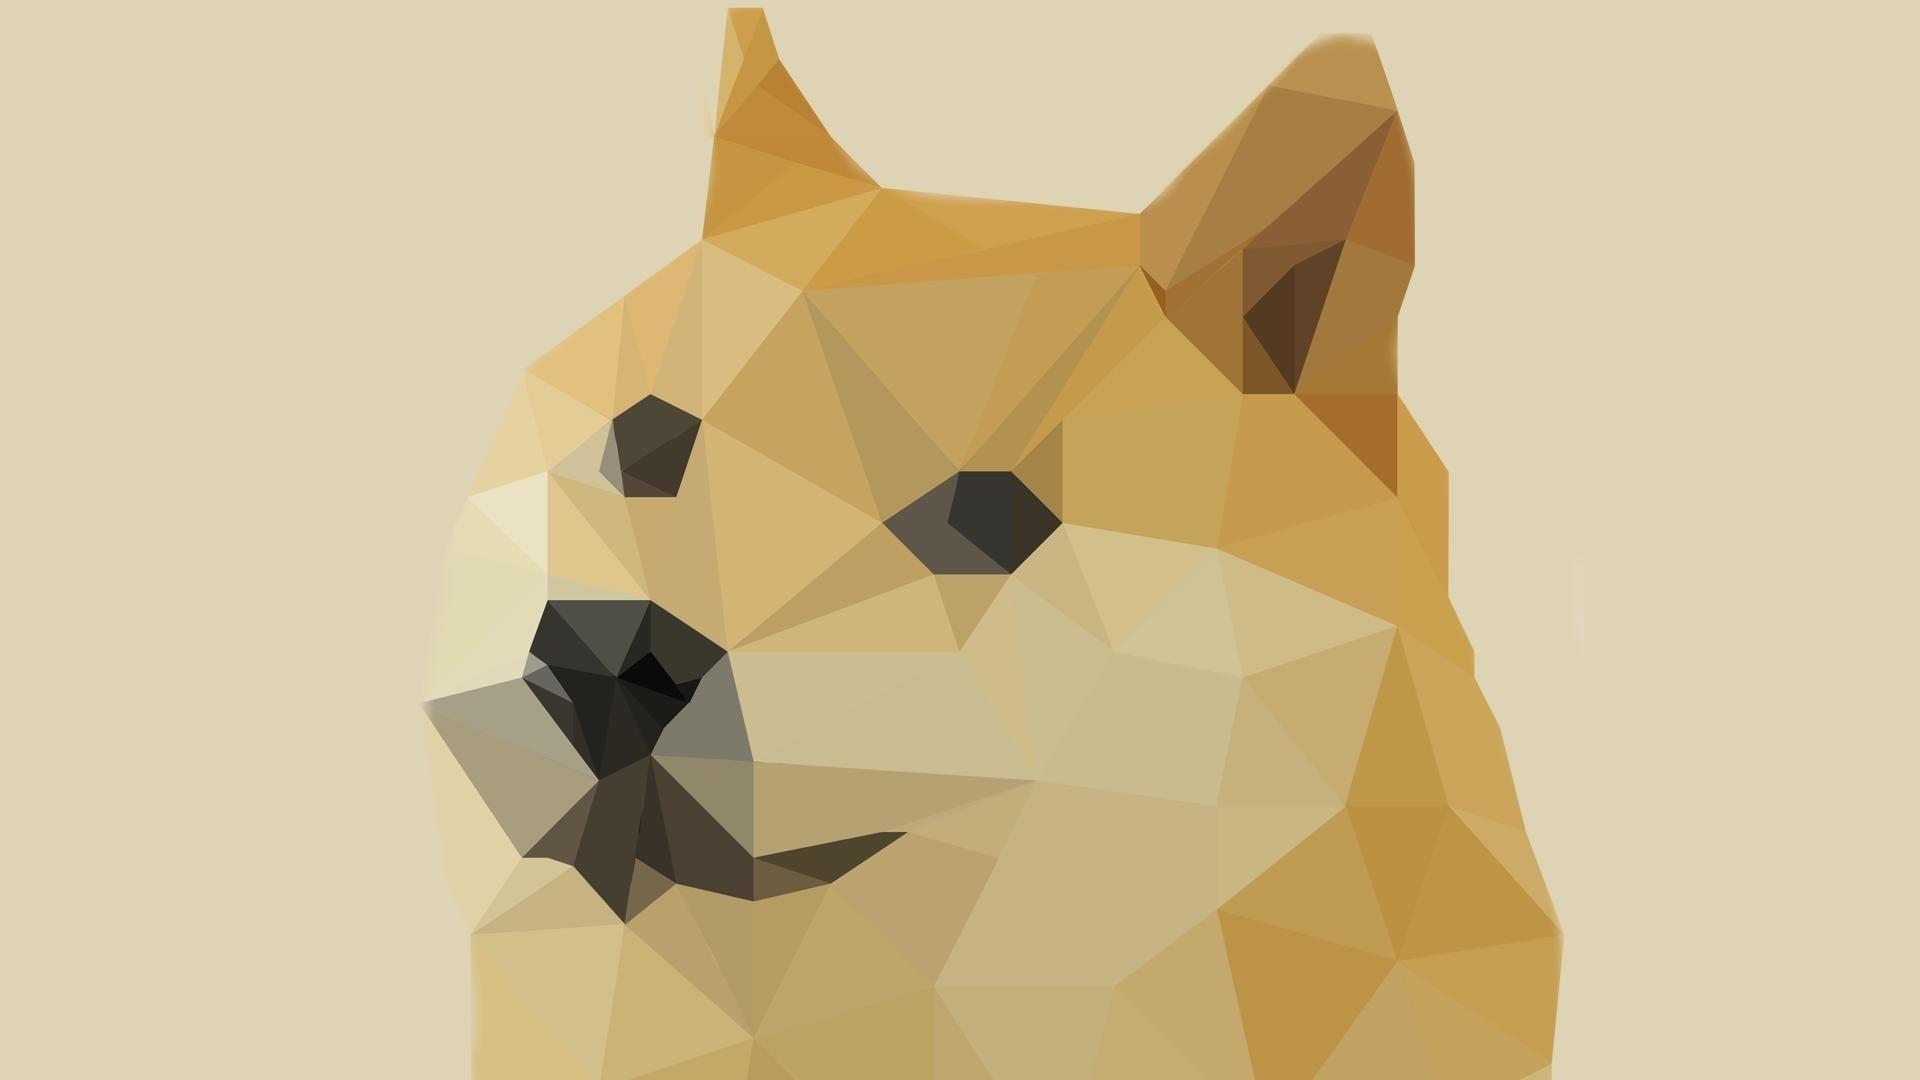 Doge Meme hd background